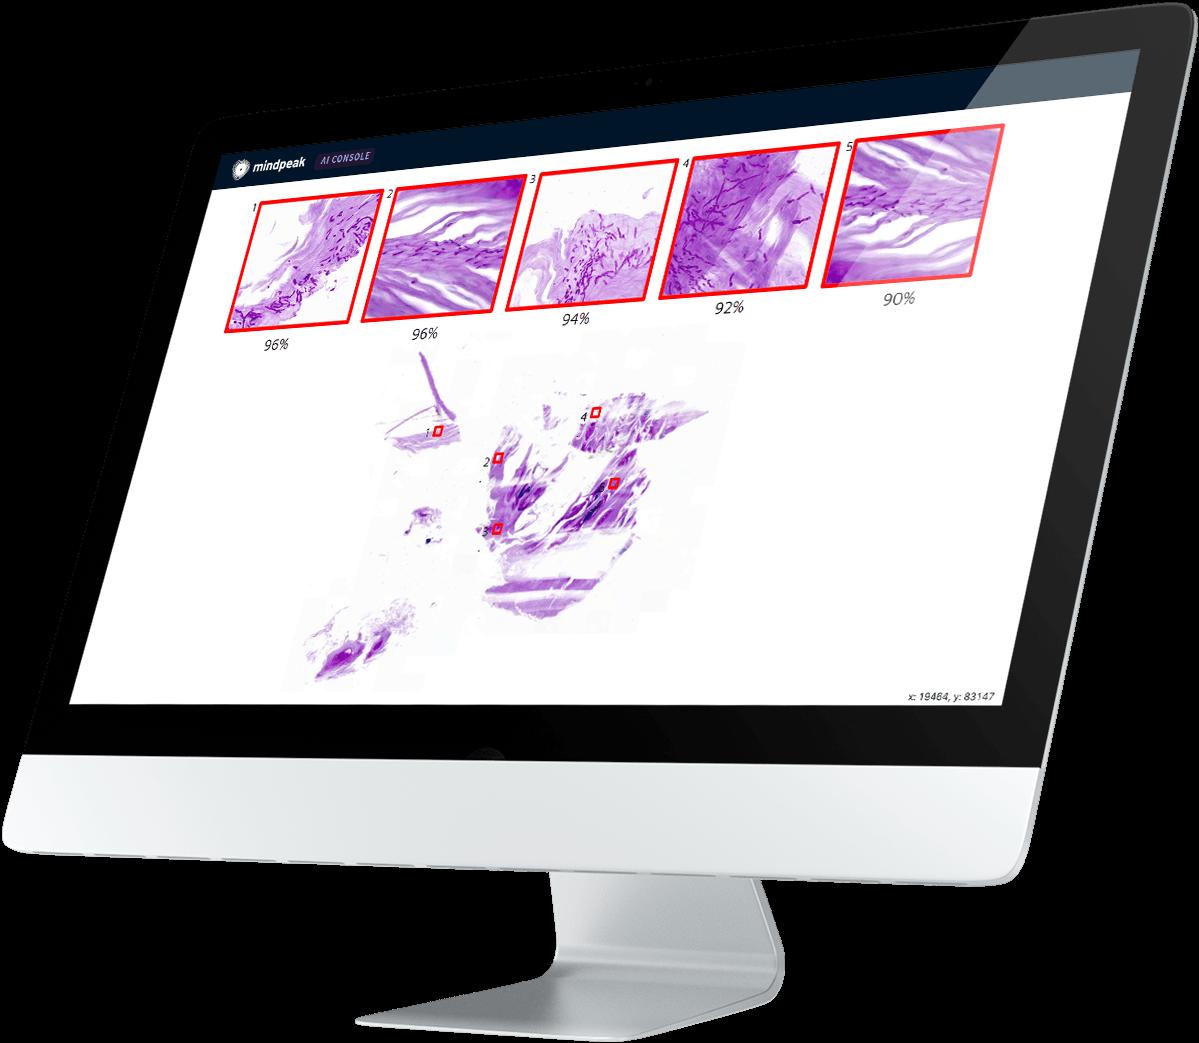 Mindpeak Breast IHC being displayed on a monitor